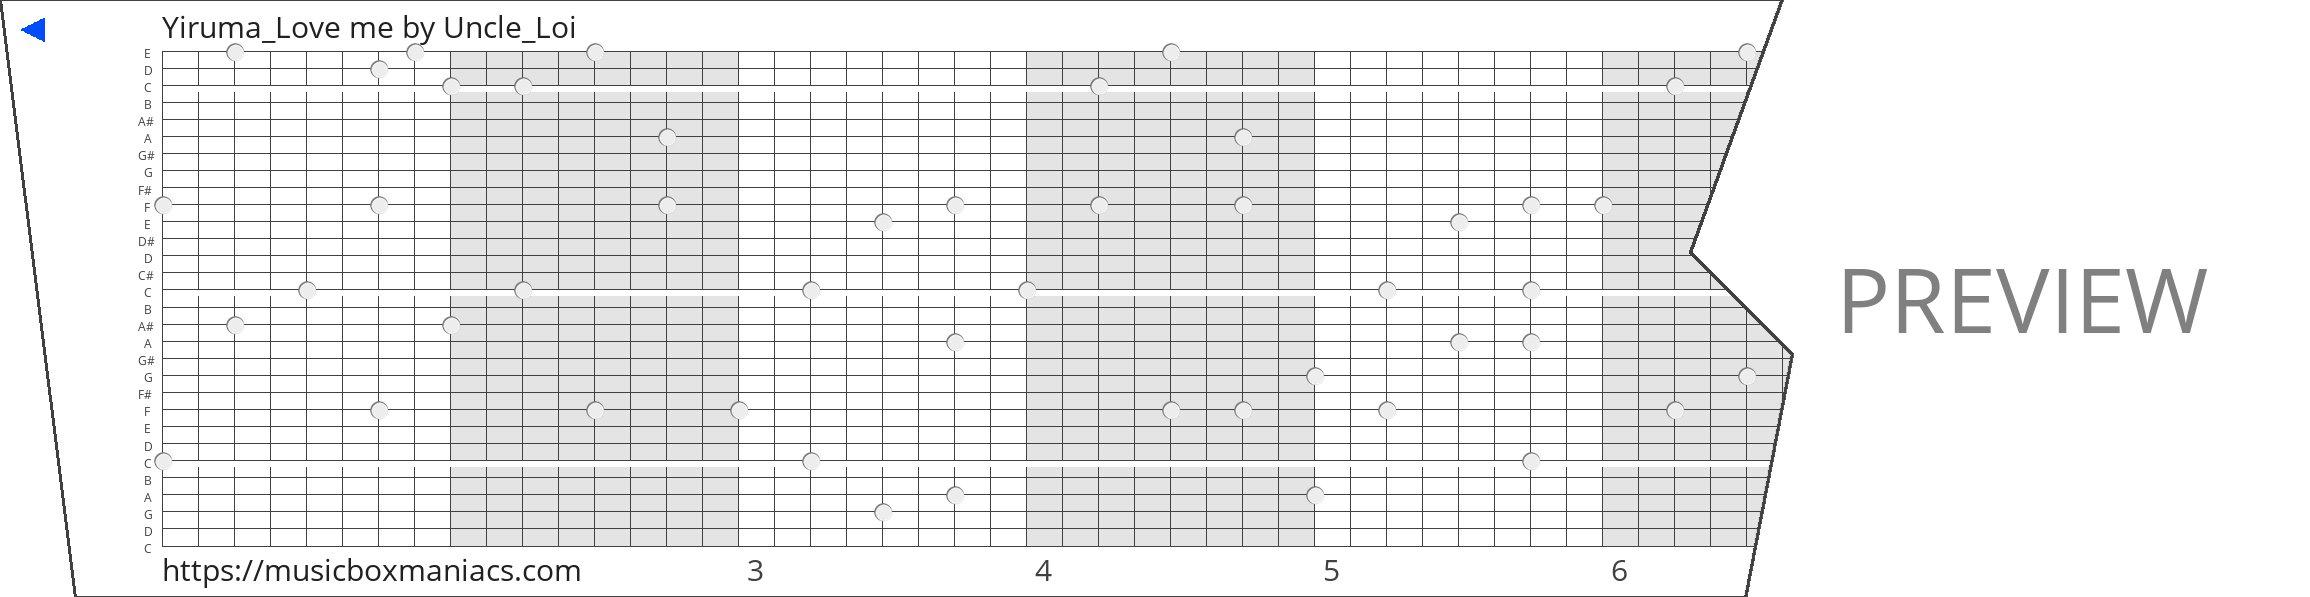 Yiruma_Love me 30 note music box paper strip